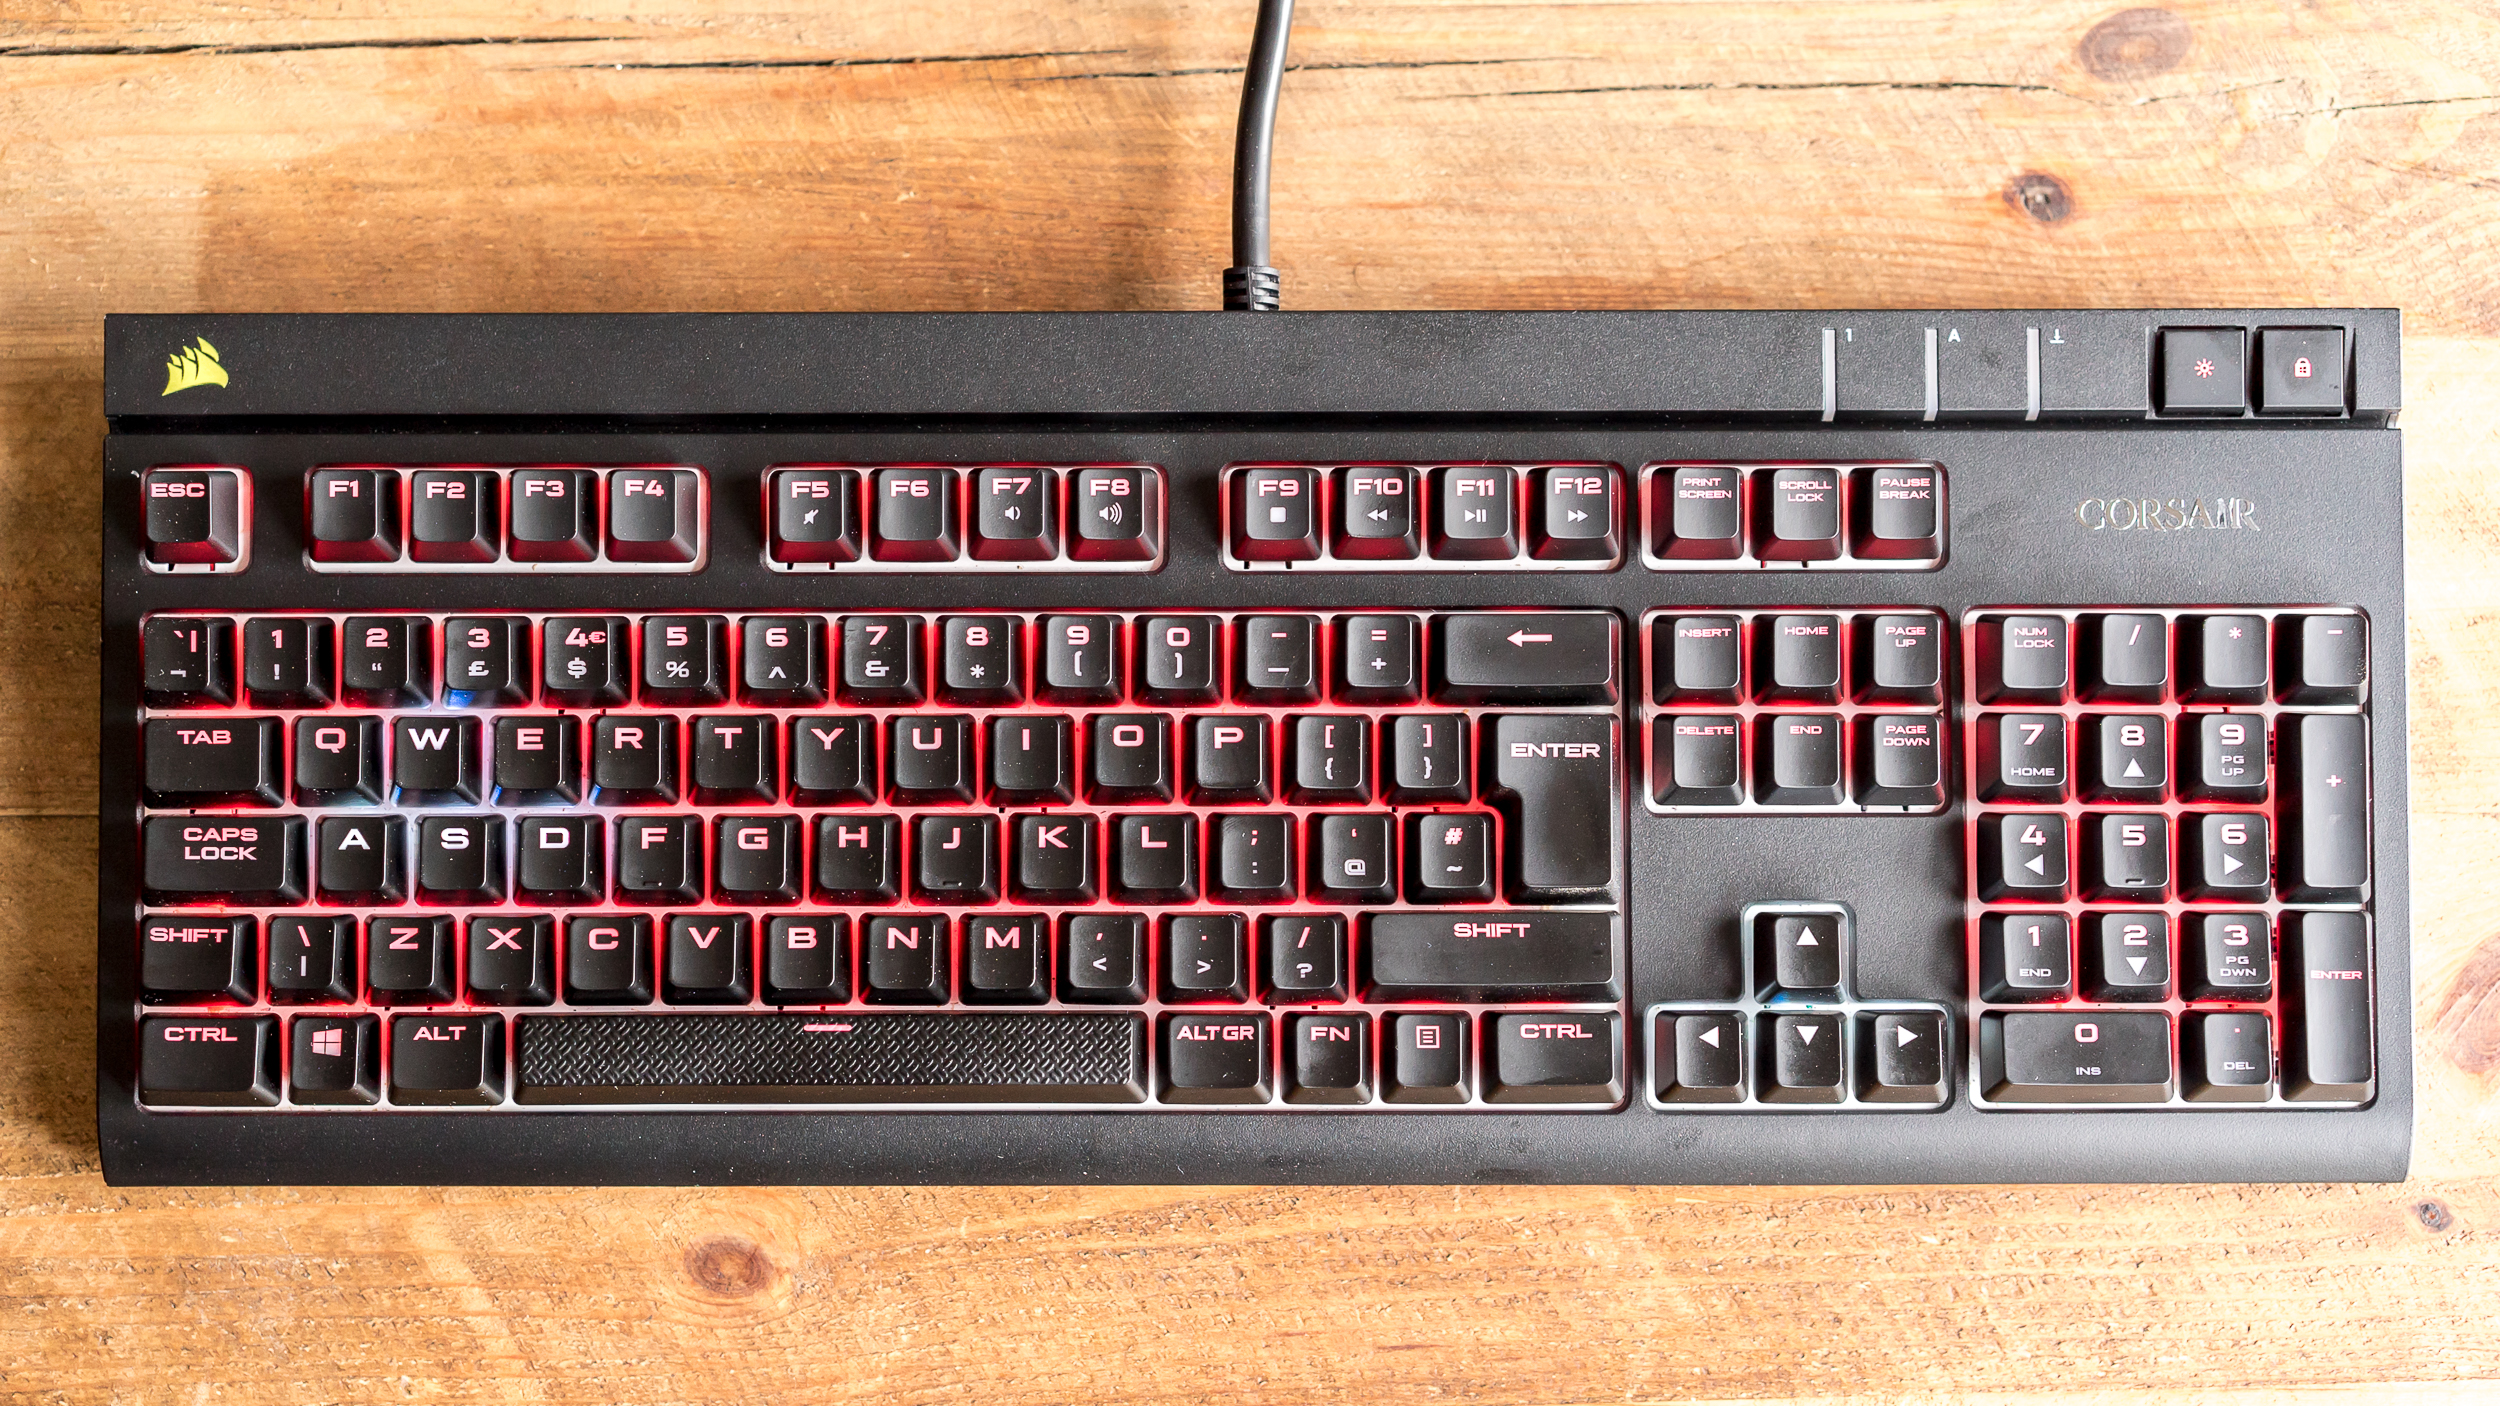 Corsair MX Silent mini-review: Can a mechanical keyboard